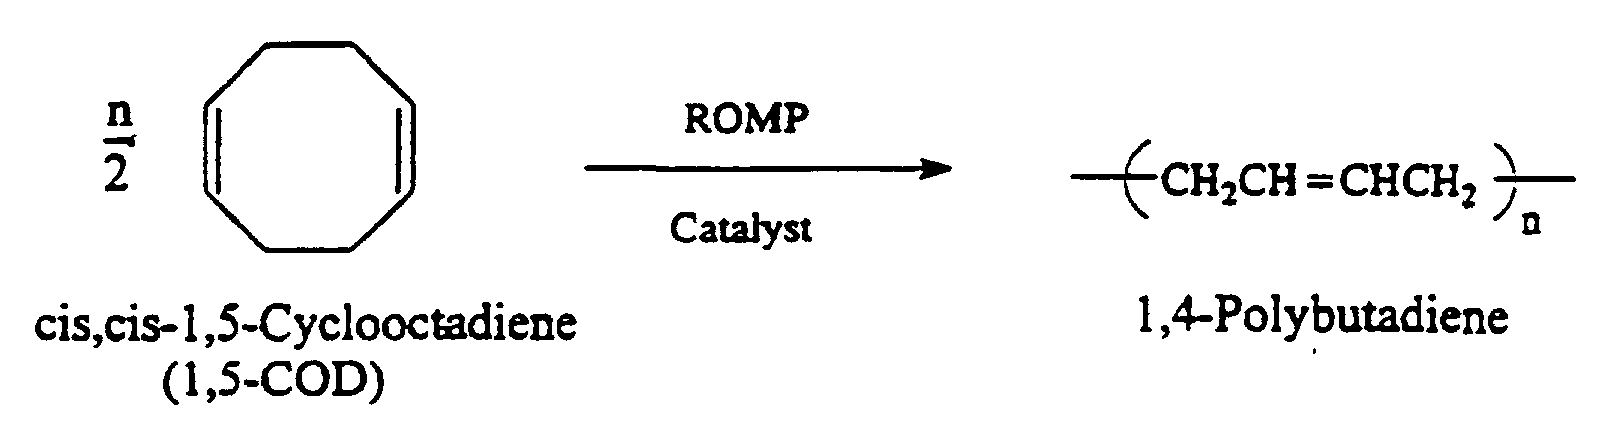 grignard metathesis polymerization Random regioregular copolymers of 3-hexylthiophene and 3,4-ethylenedioxythiophene were synthesized by grignard metathesis polymerization.